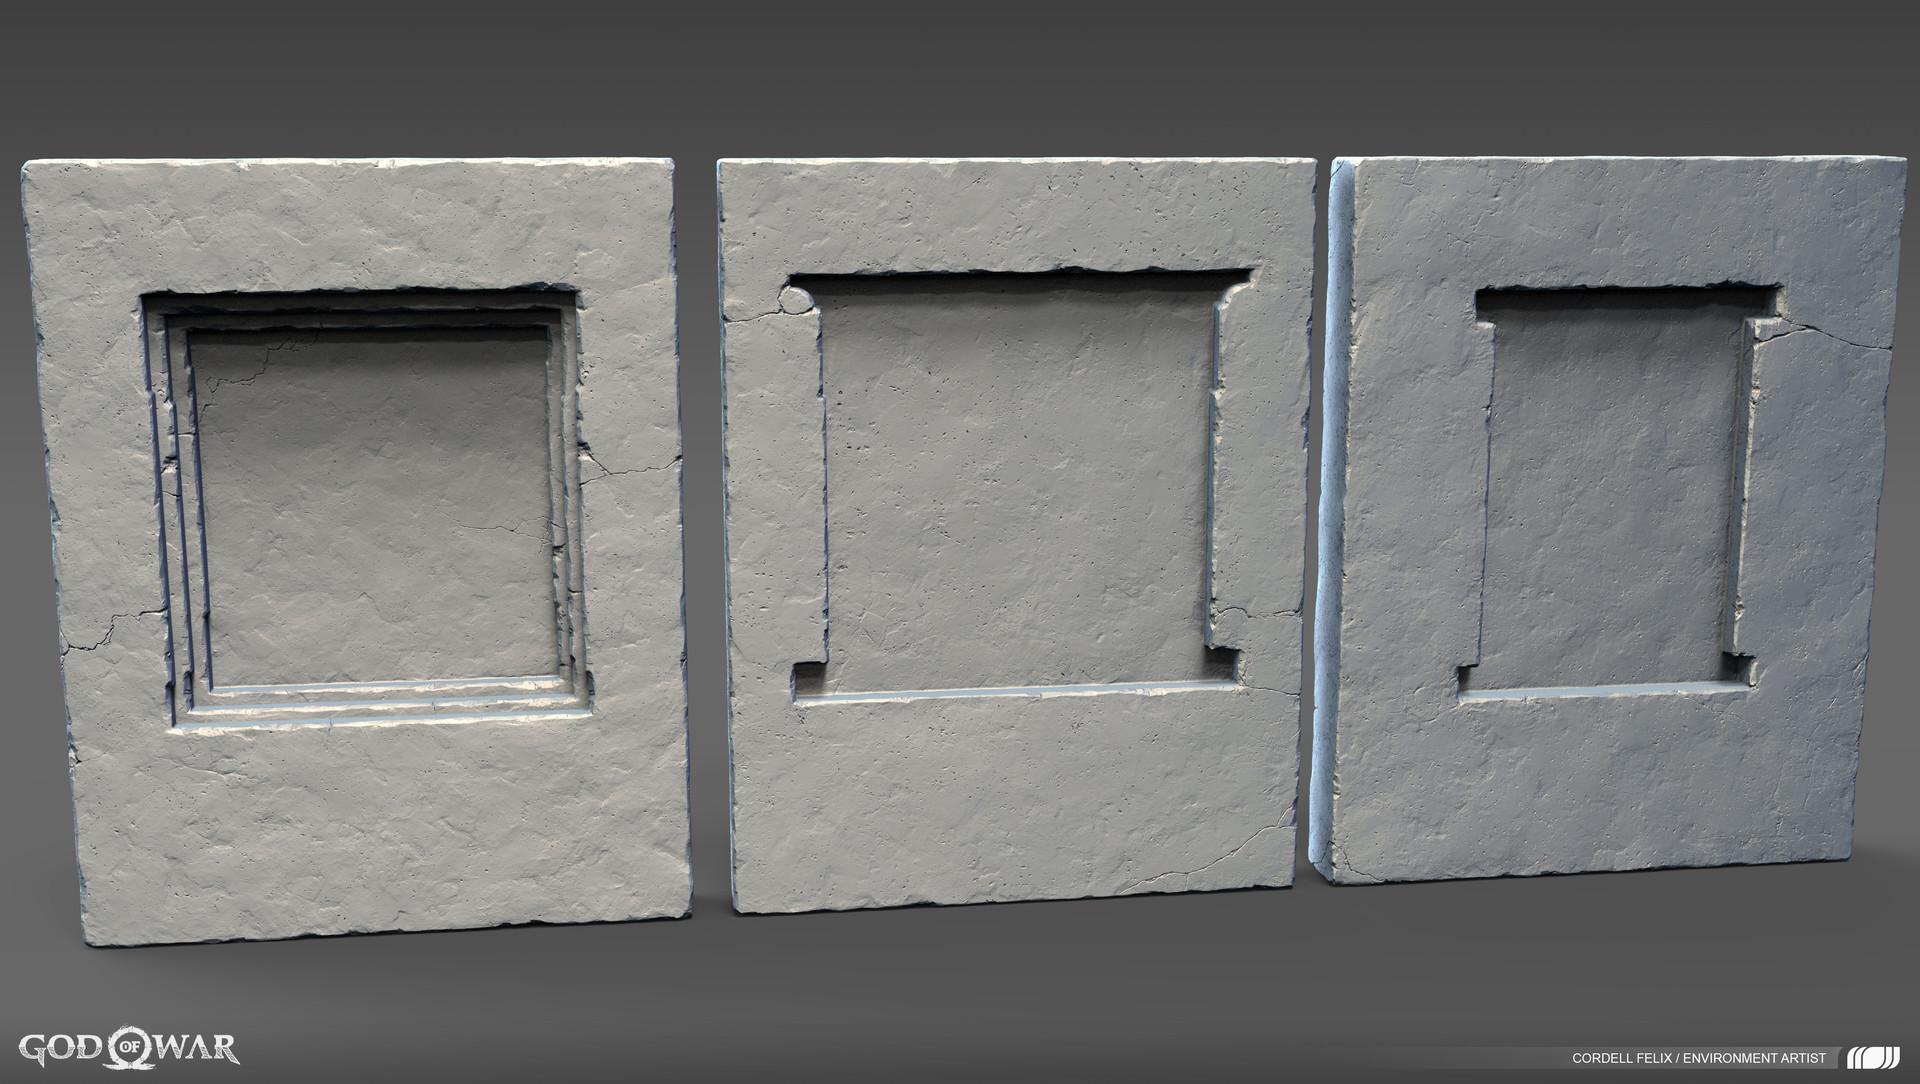 Cordell felix stone walls large 01